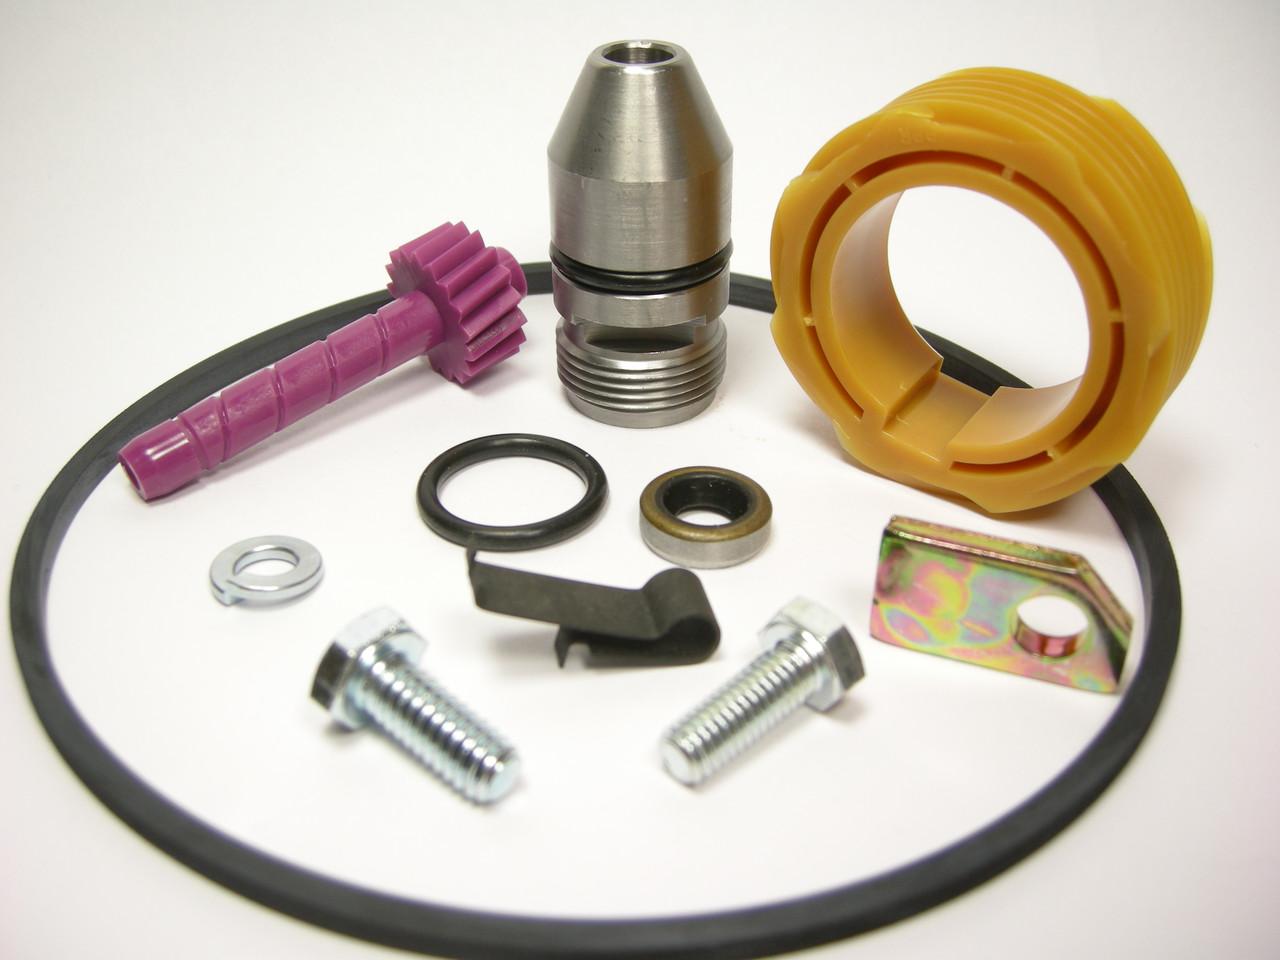 TH350 8 & 17 Tooth Speedo Kit Gears Housing Speedometer Parts